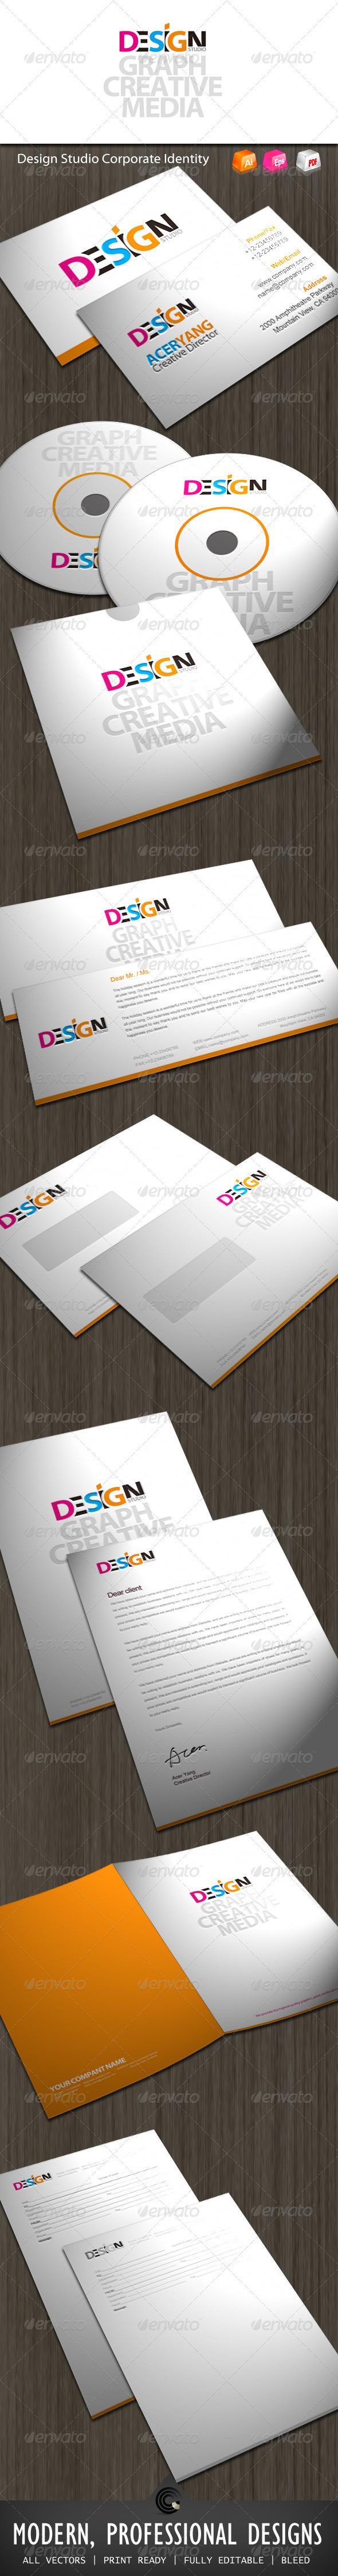 Design Studio Corporate Identity - Stationery Print Templates